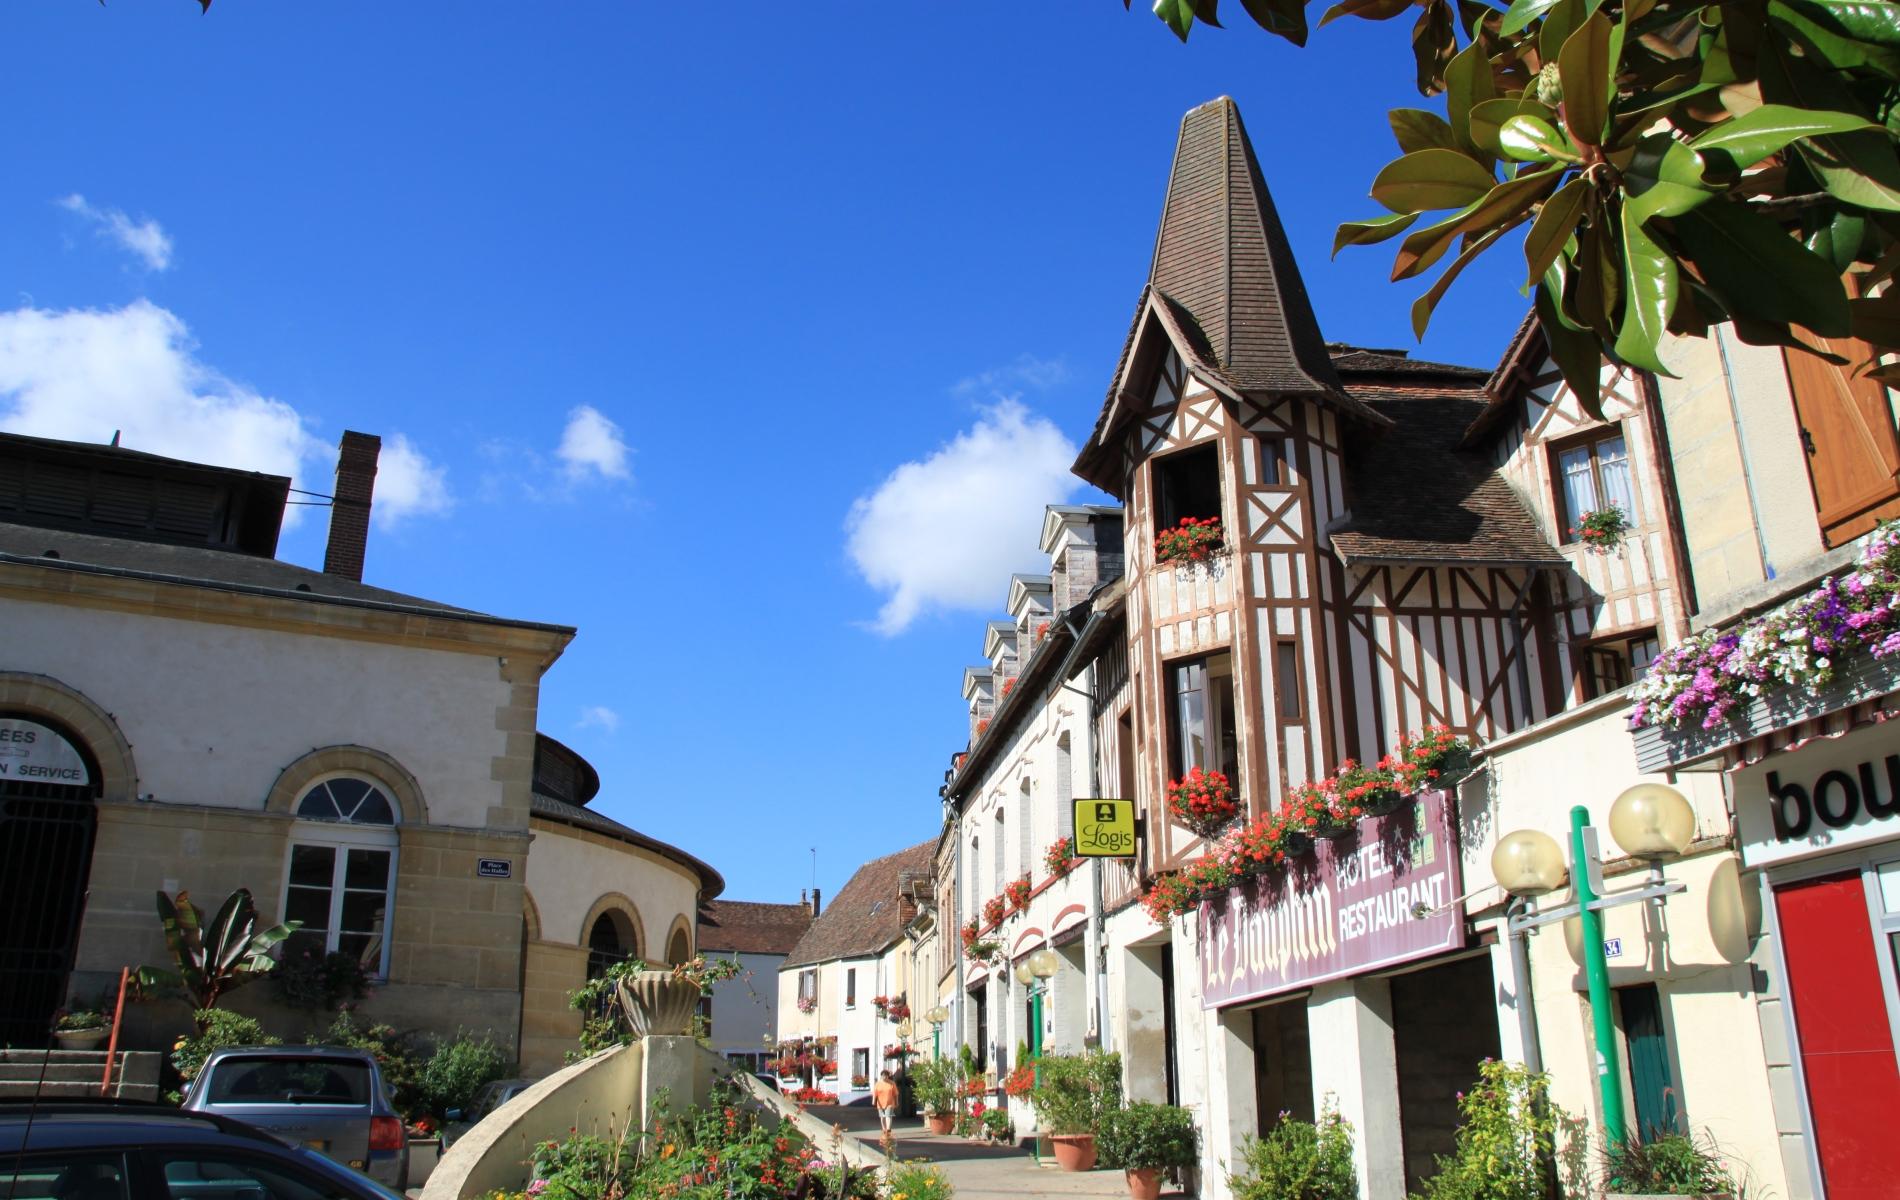 Logis hotel Le Dauphin